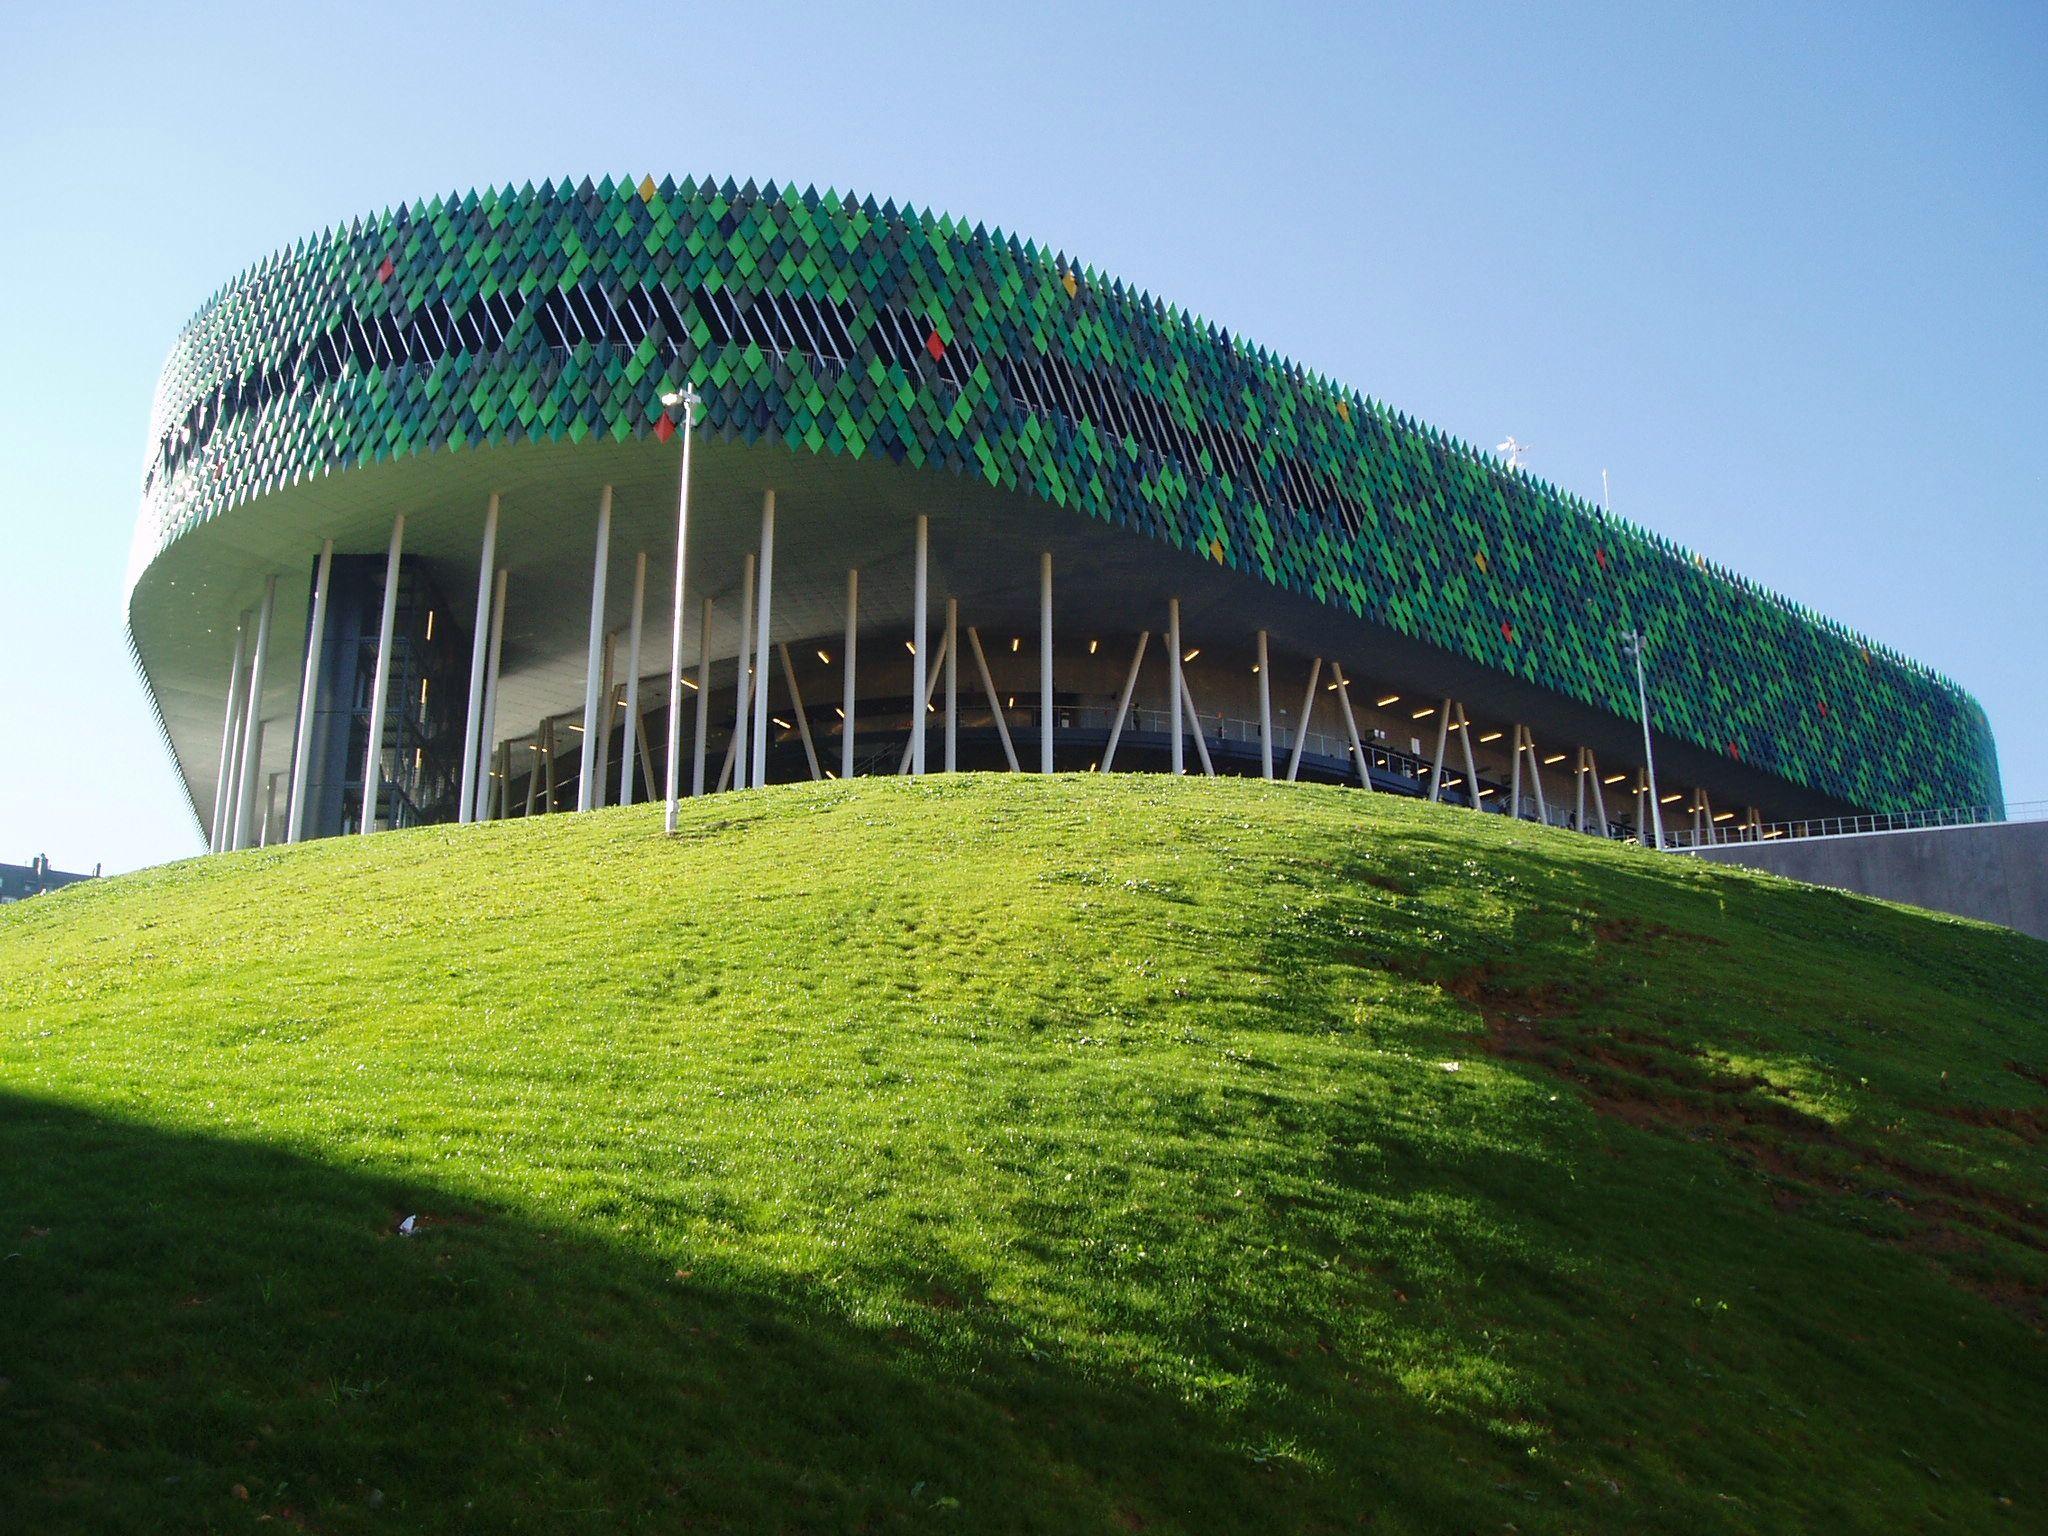 Imagen de http://upload.wikimedia.org/wikipedia/commons/5/50/Bilbao_Arena.jpg.